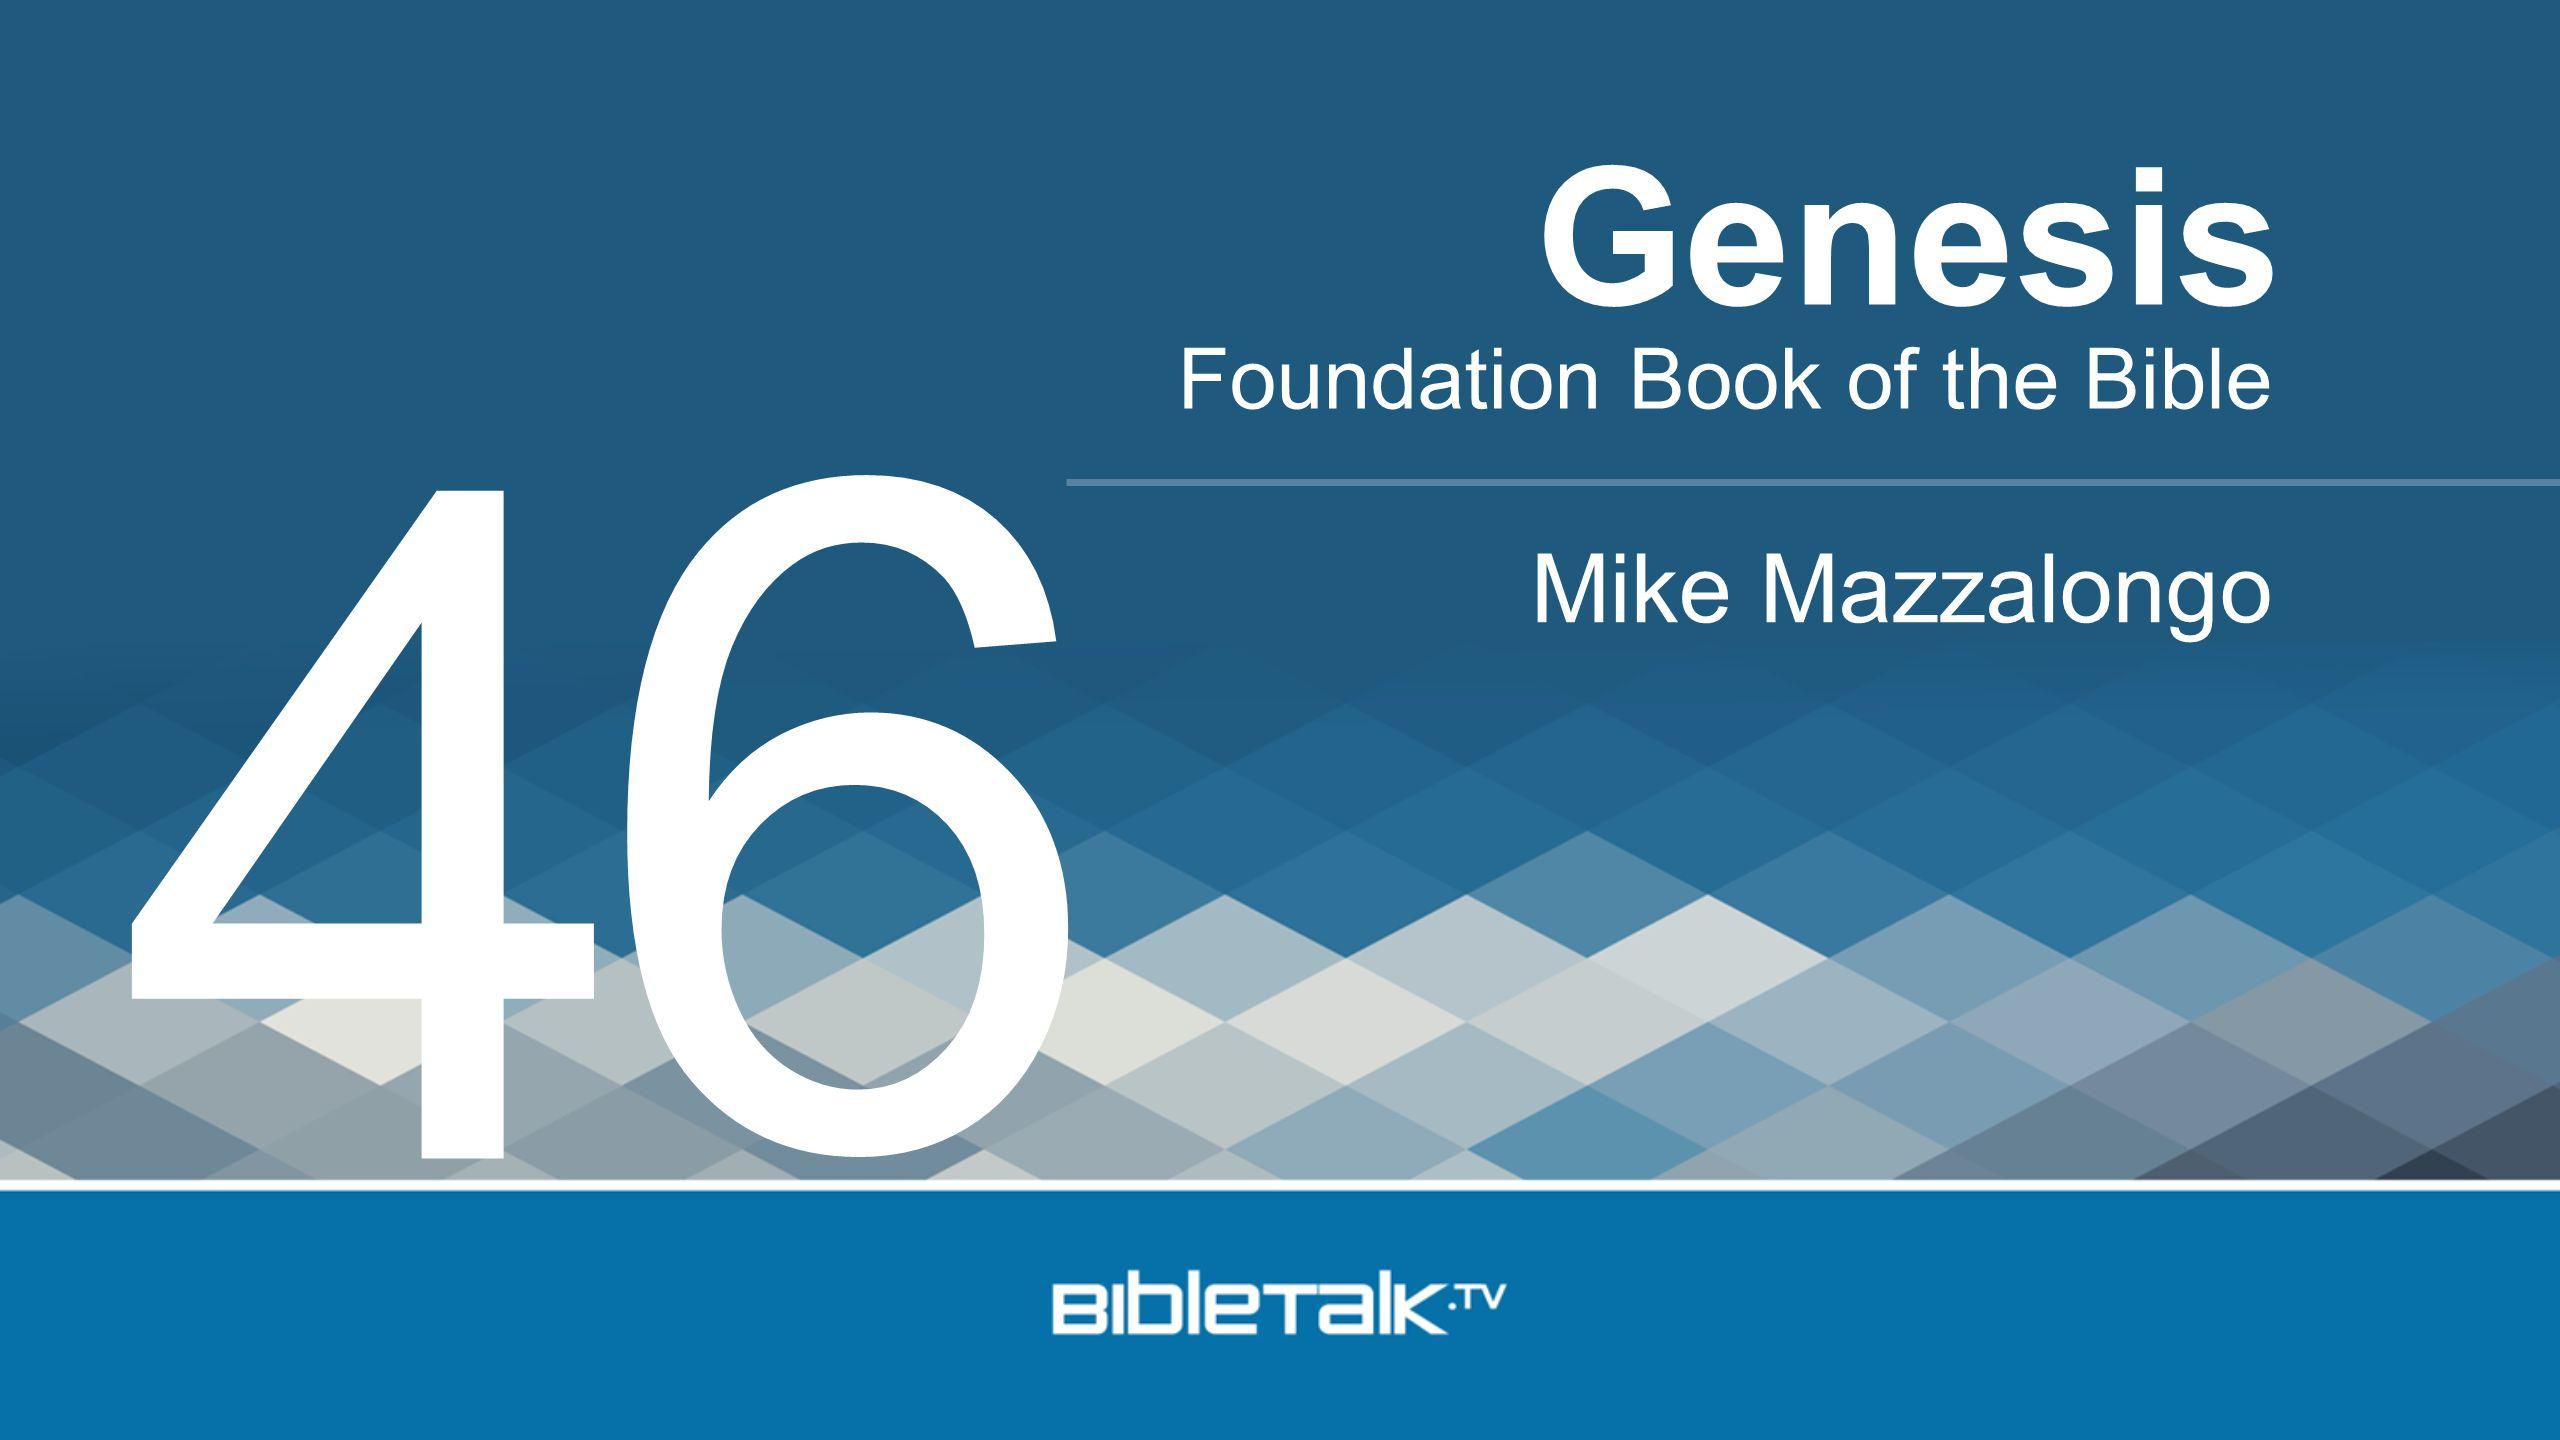 Foundation Book of the Bible Mike Mazzalongo Genesis 4 6